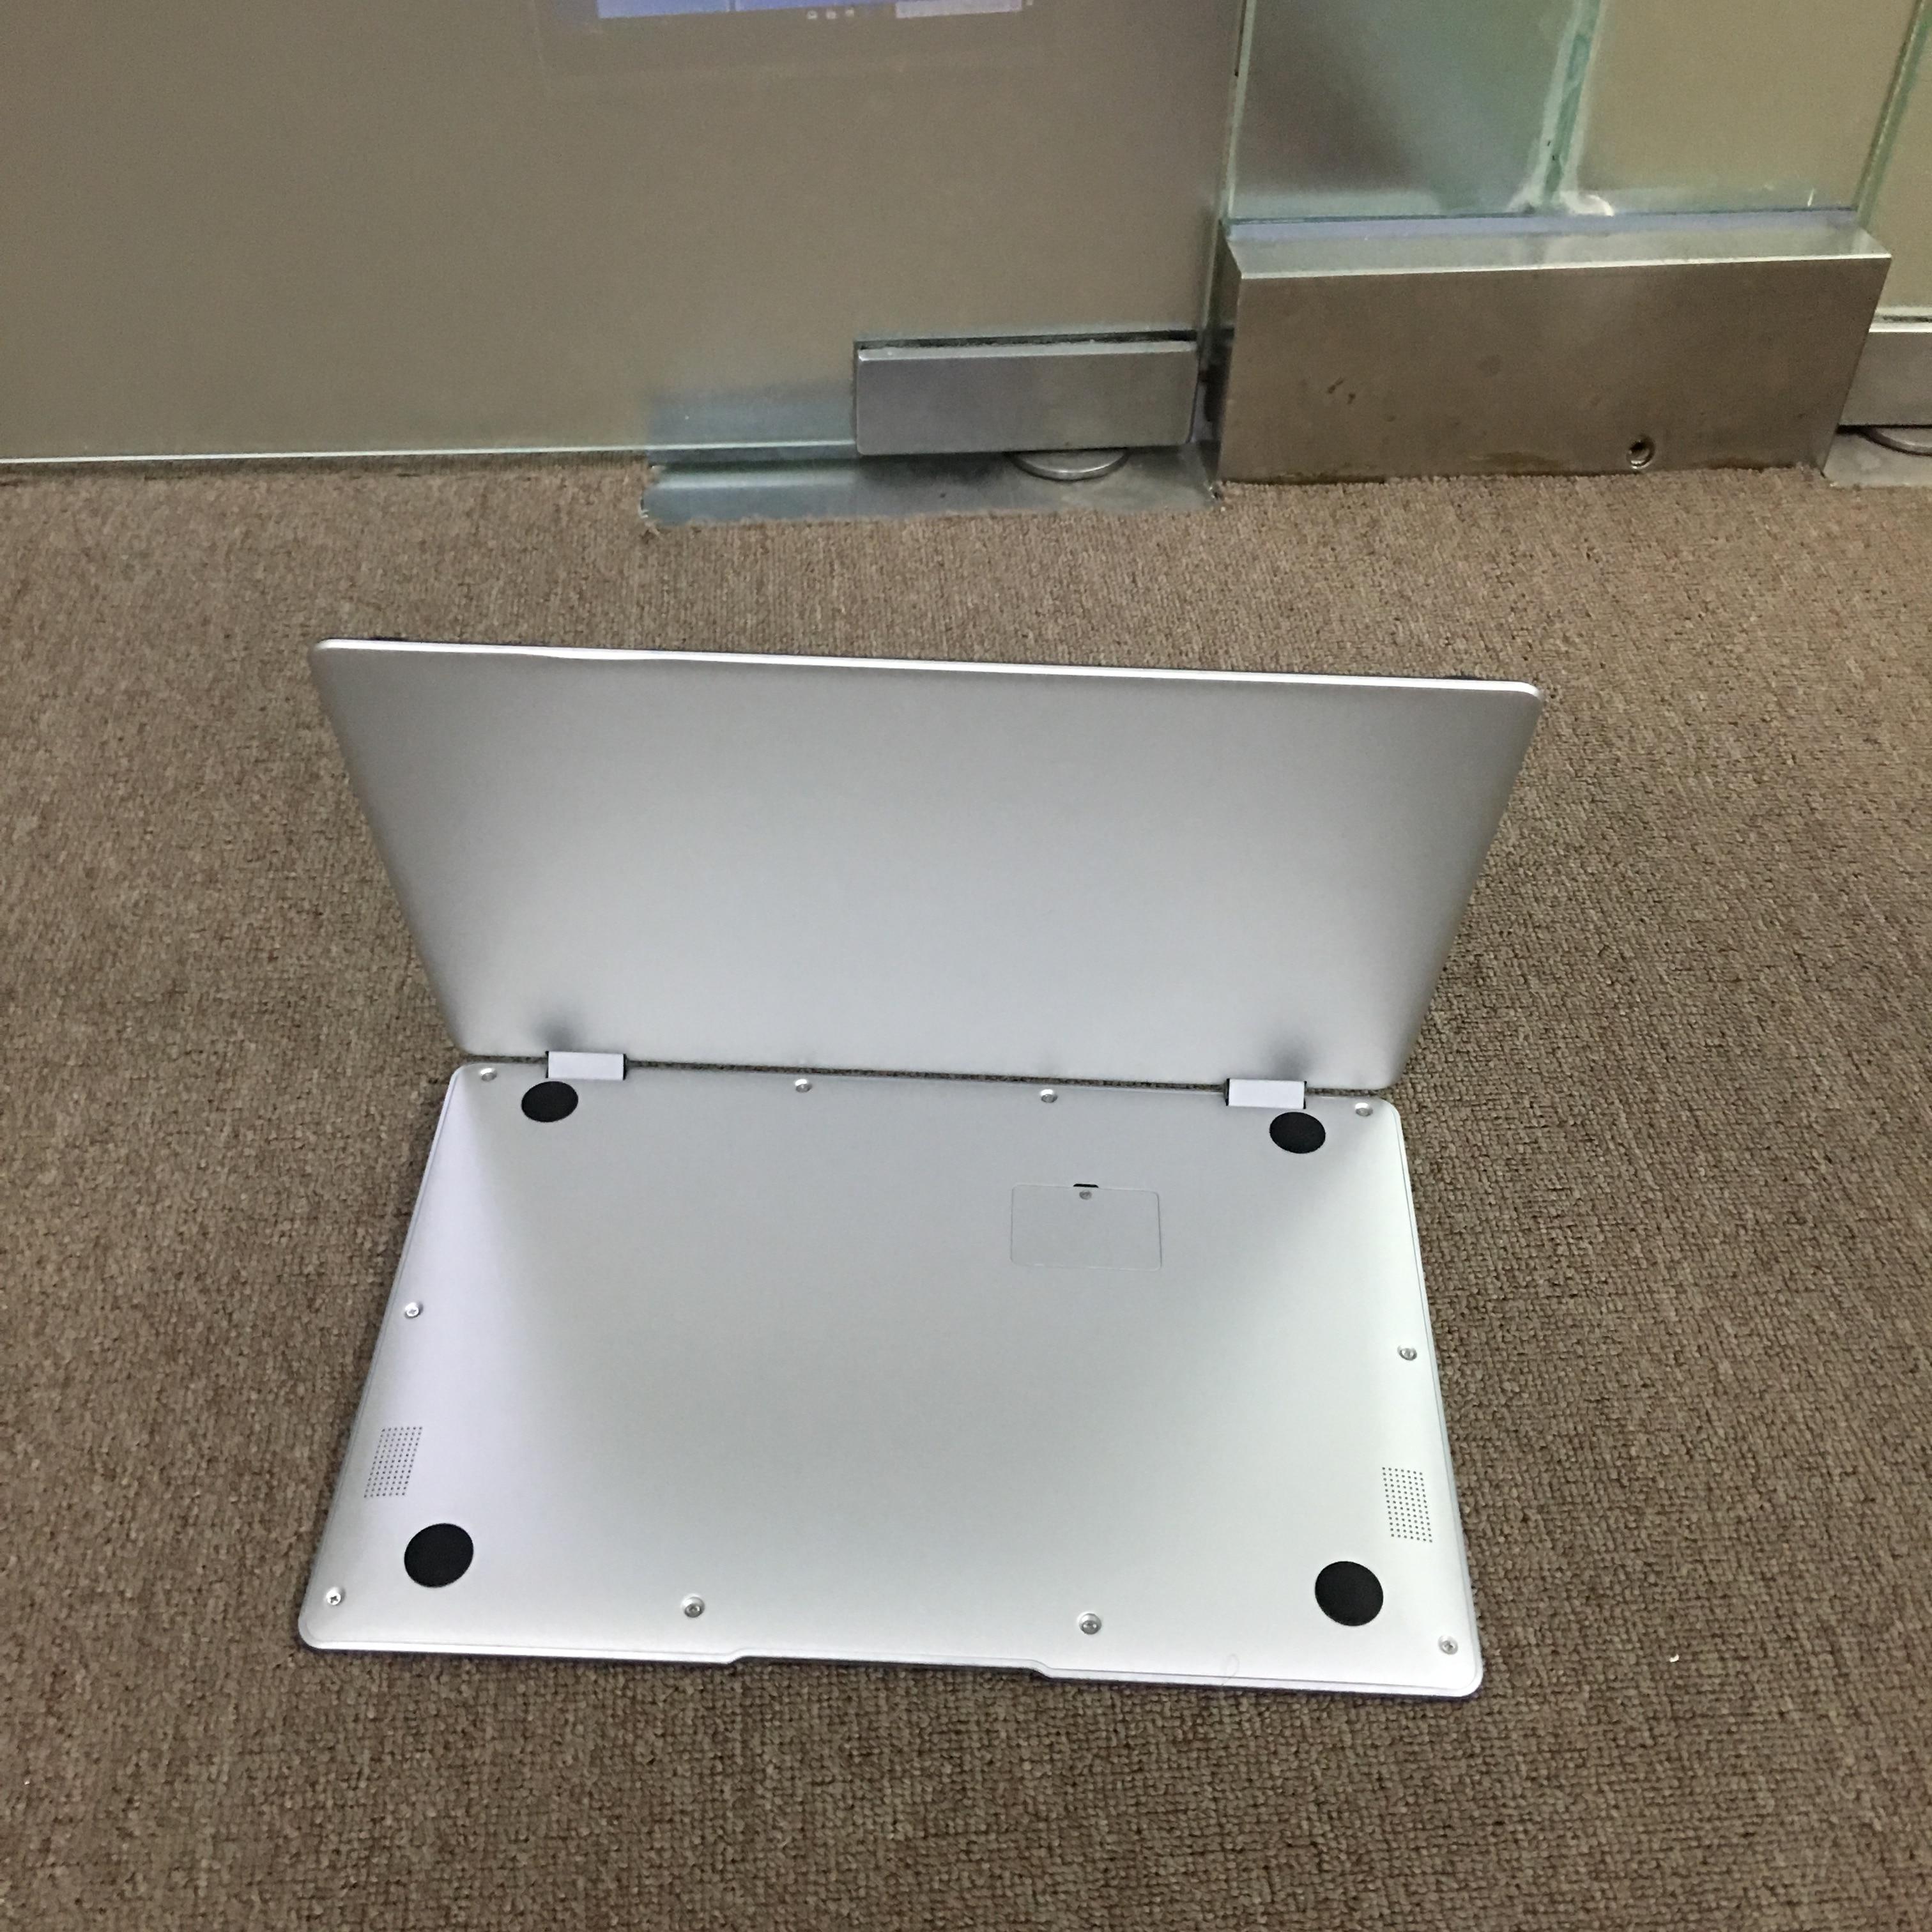 Lapbook SE 13.3 Inch Laptop , Win10 OS Intel Gemini Lake Processor 4GB RAM 32GB EMMC + 128G SSD Notebook Pc Laptop